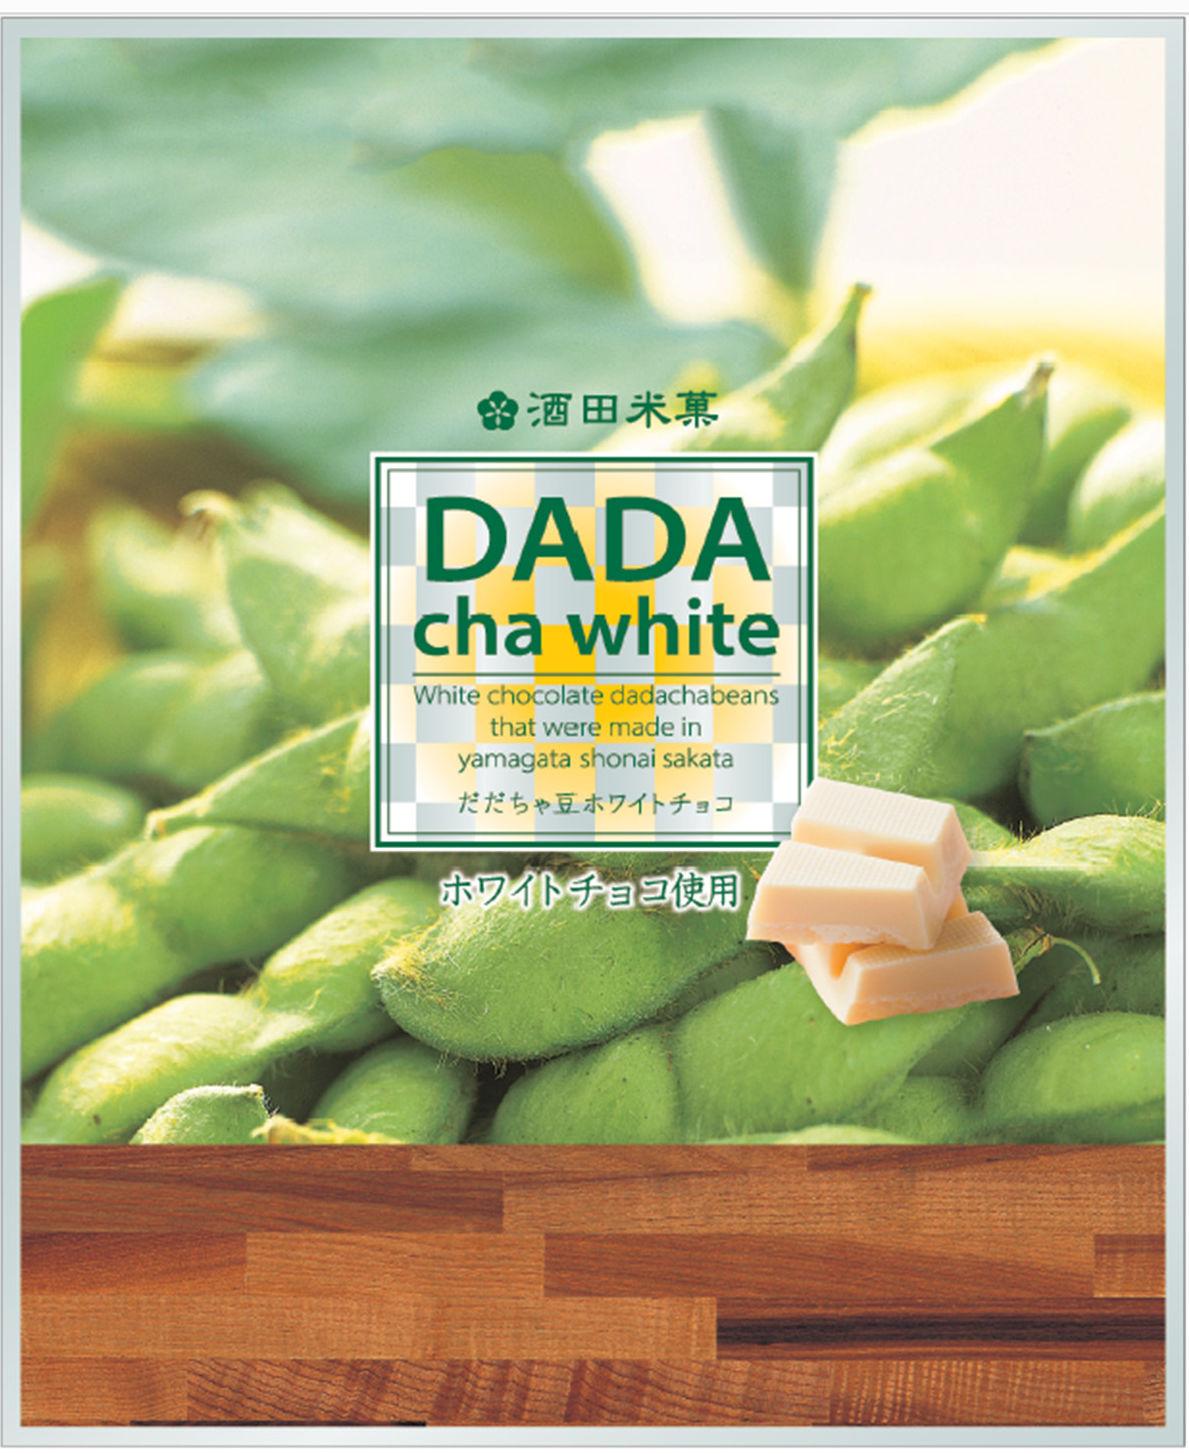 DADA cha white(だだちゃホワイト)